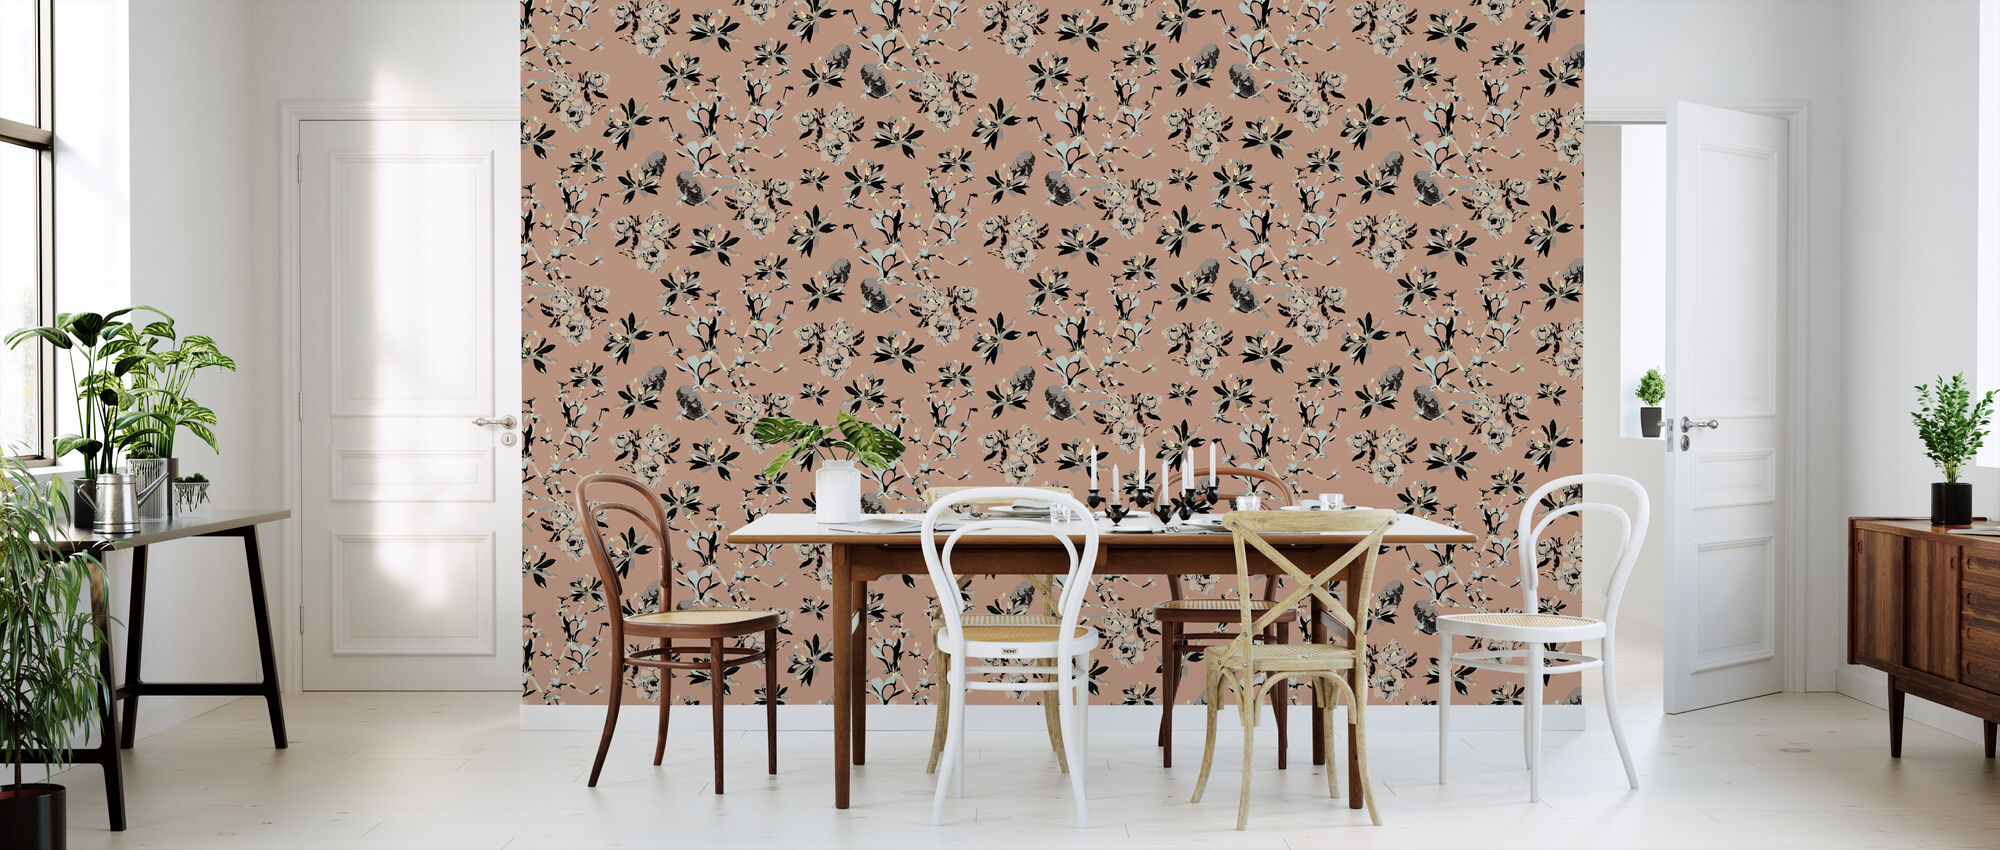 mothers magnolia pink mit tapeten einrichten photowall. Black Bedroom Furniture Sets. Home Design Ideas